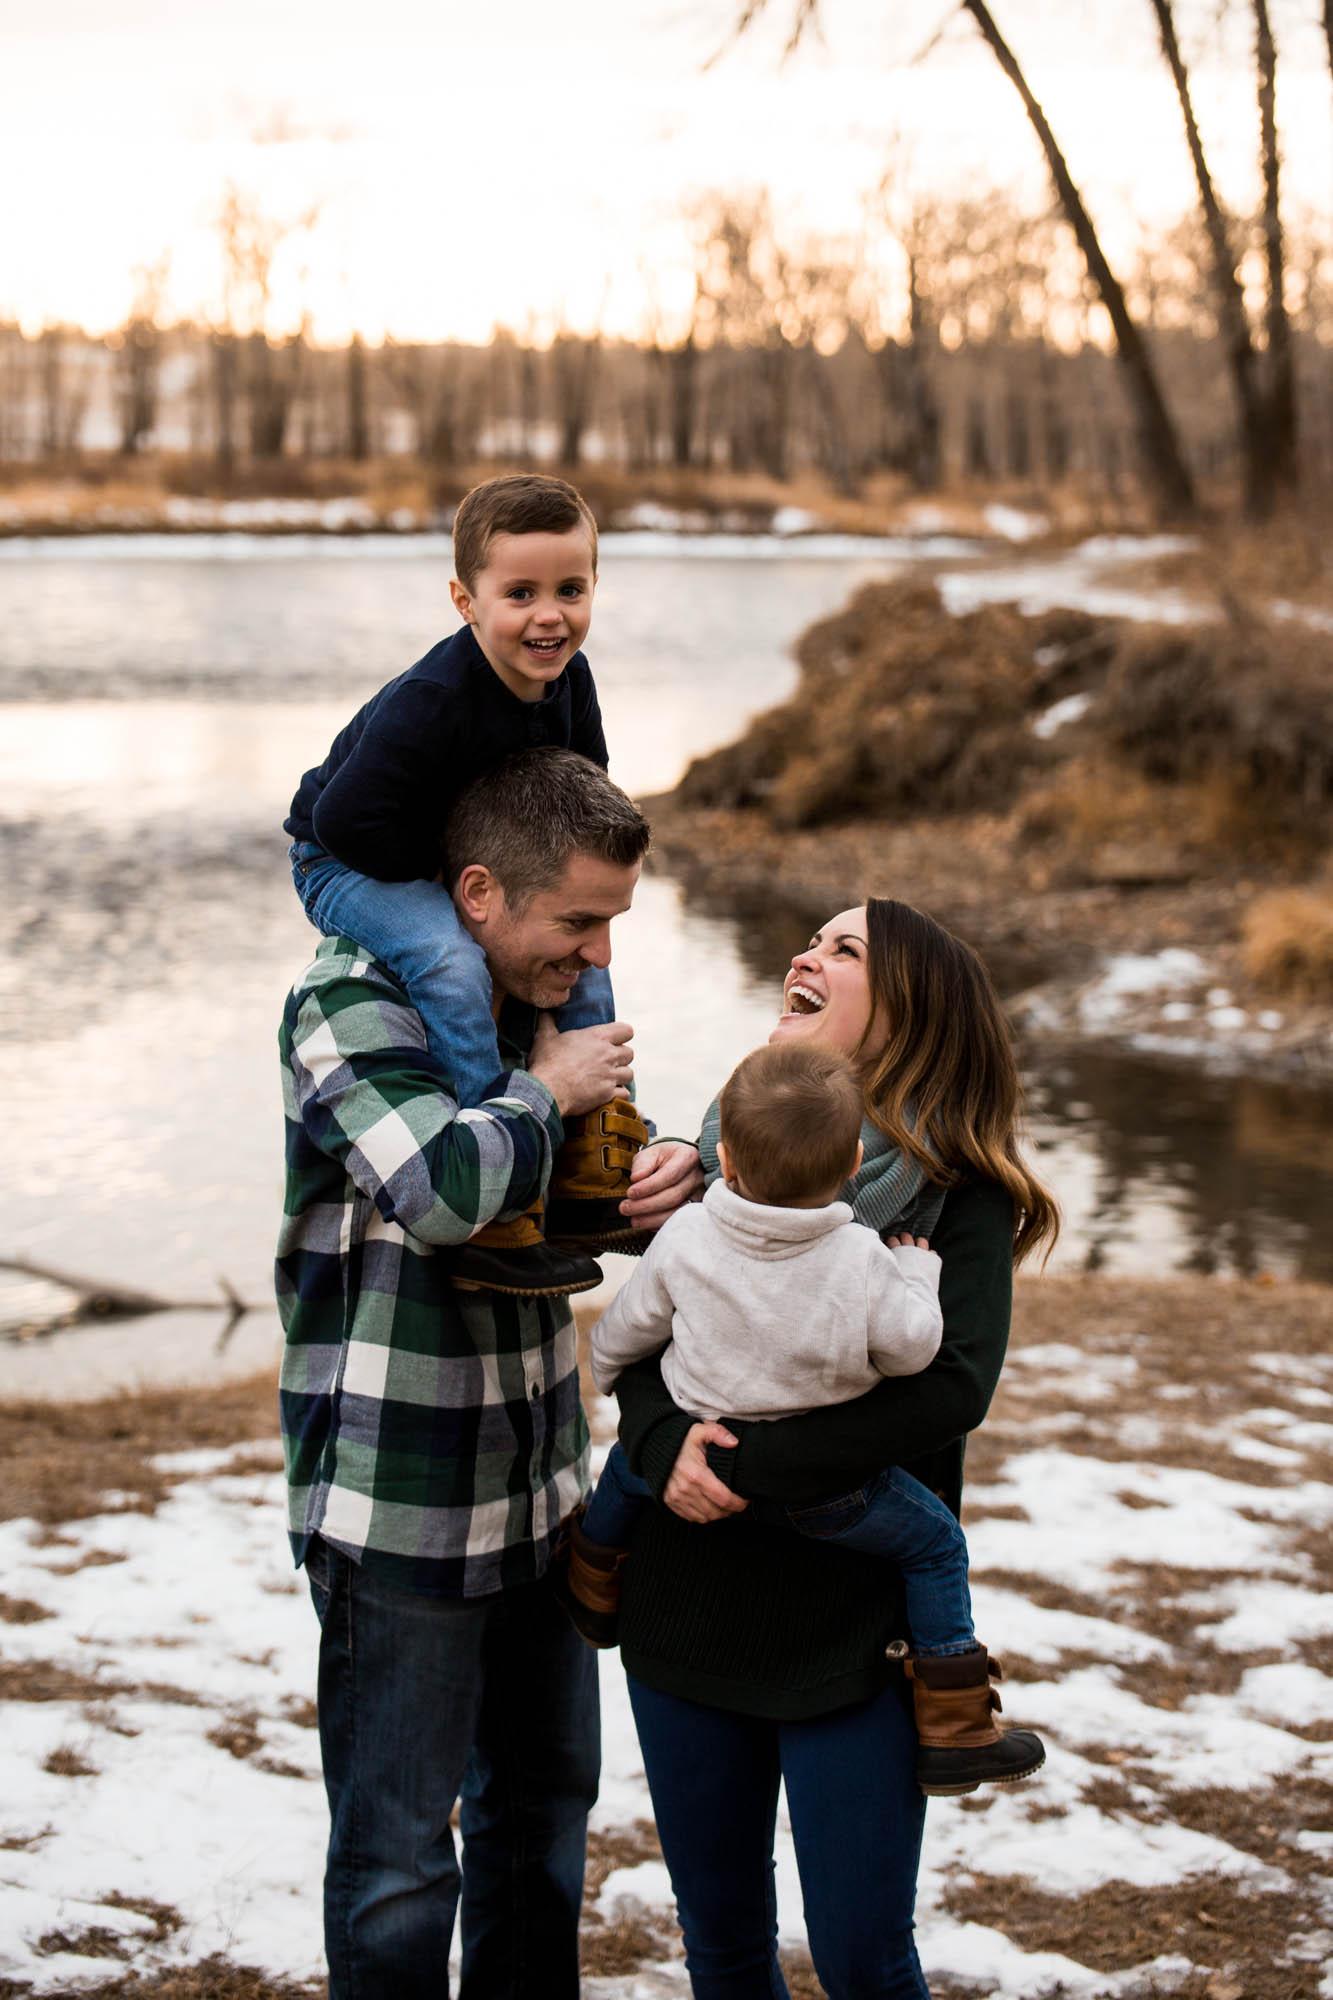 Calgary family photographer - family photography at Carburn Park